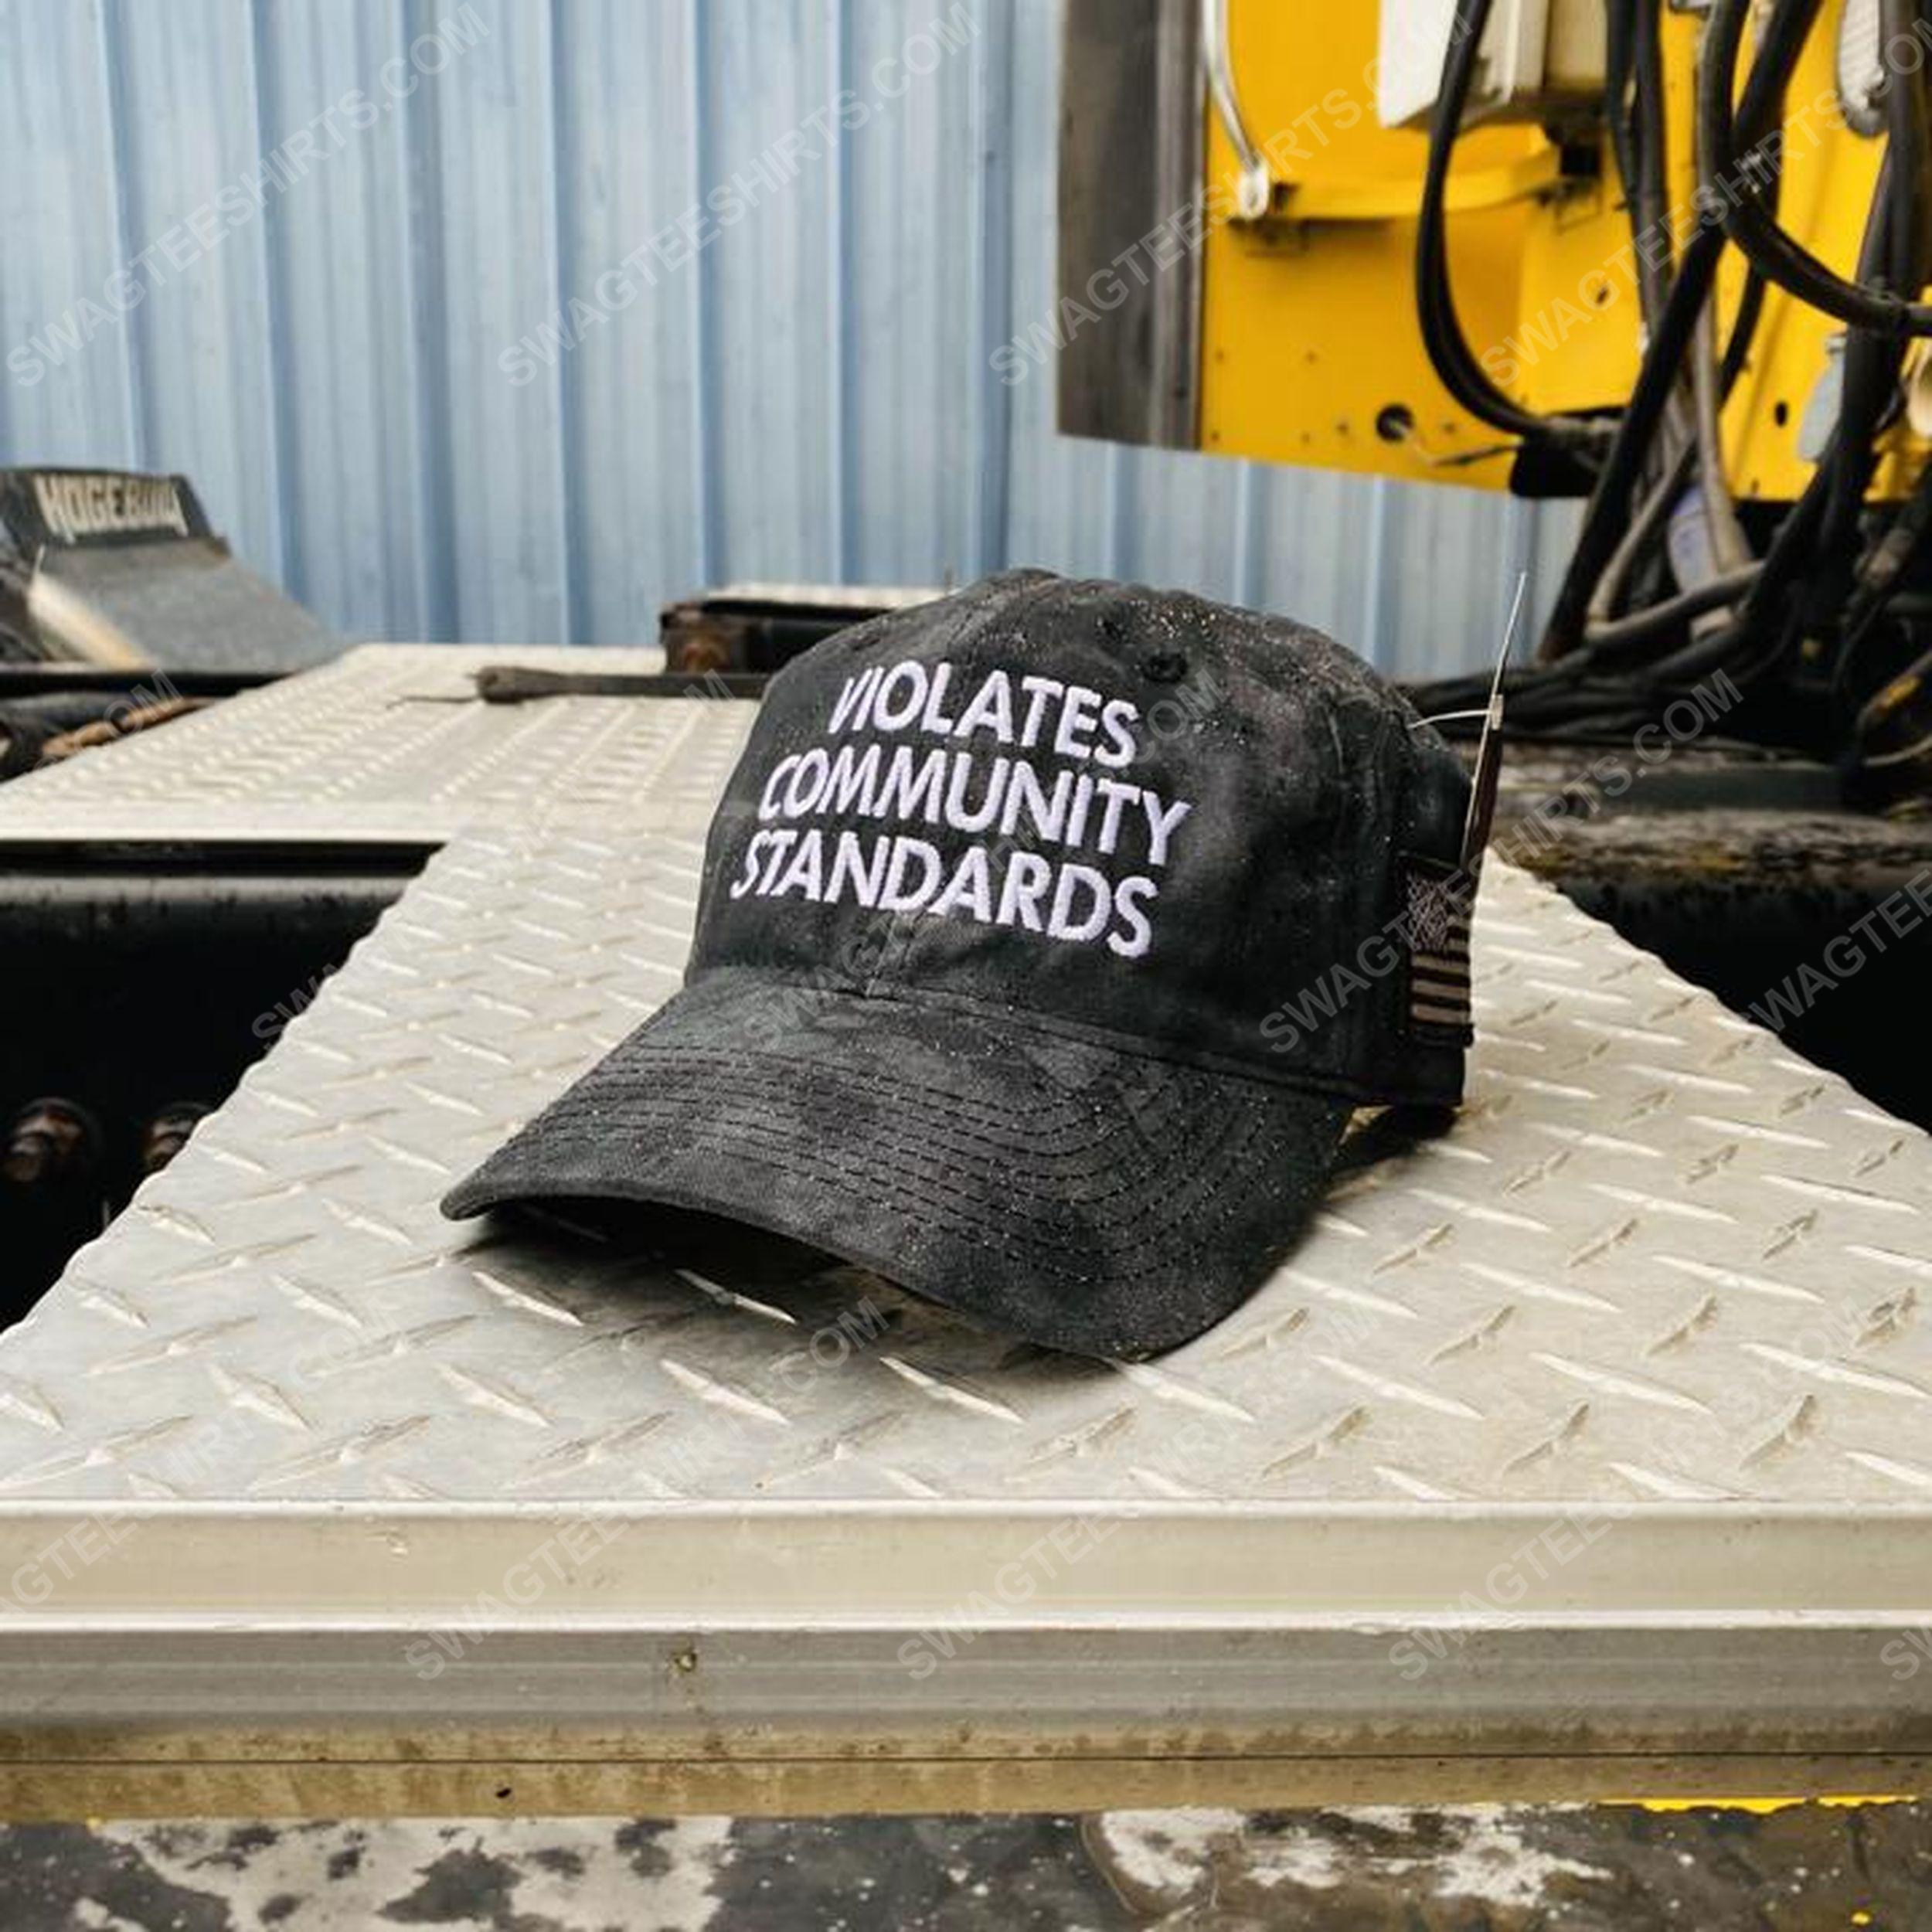 Violates community standards full print classic hat 1 - Copy (3)